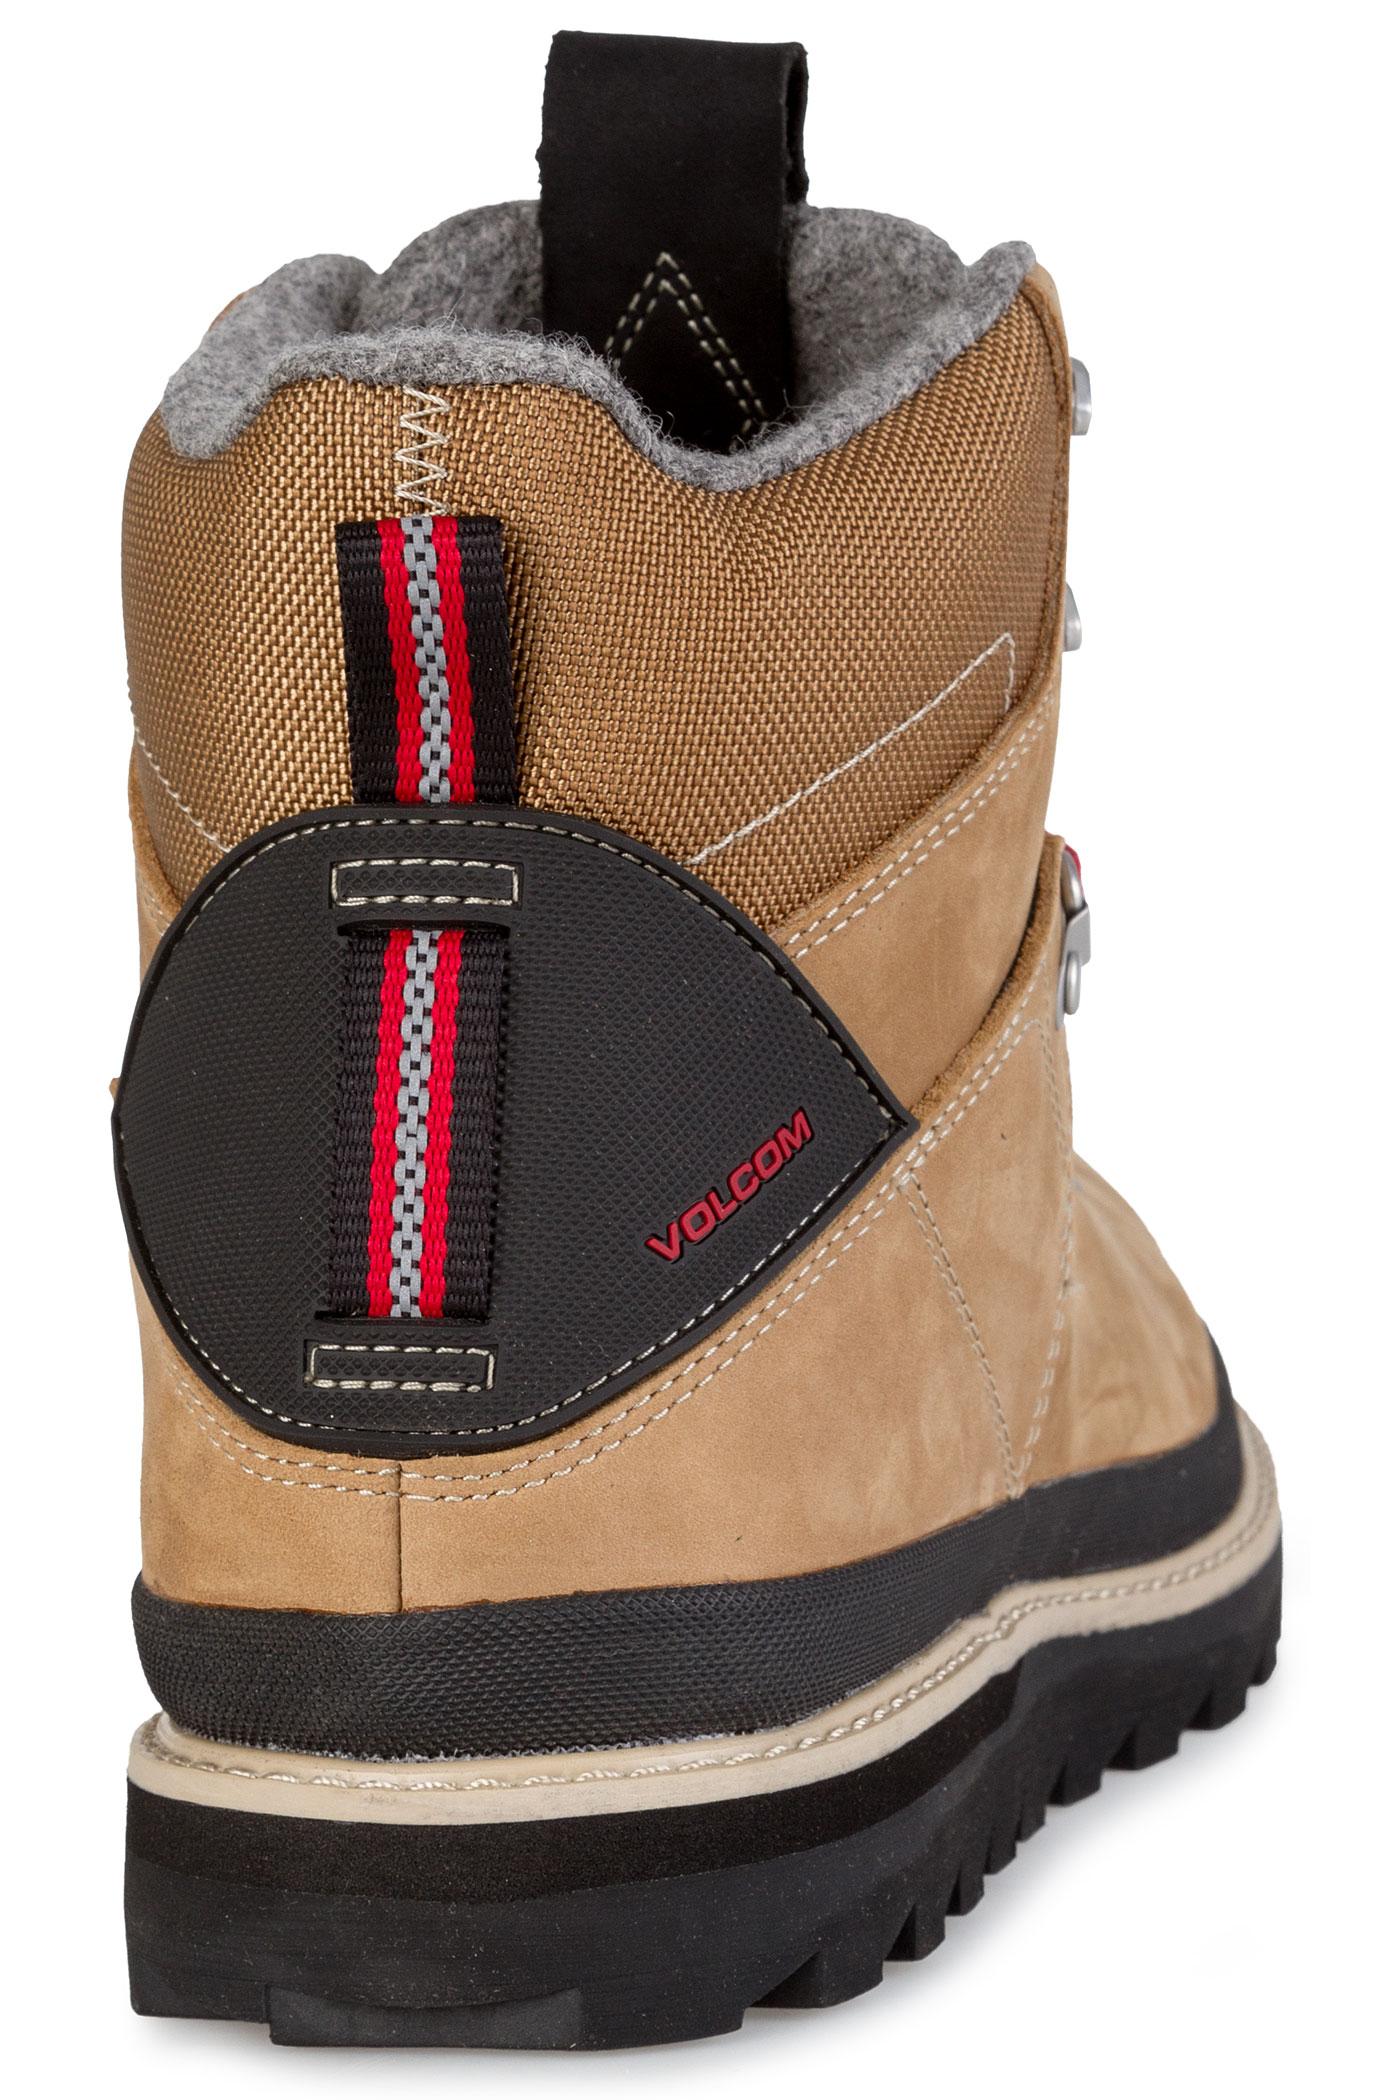 Outlander Shoes Brand